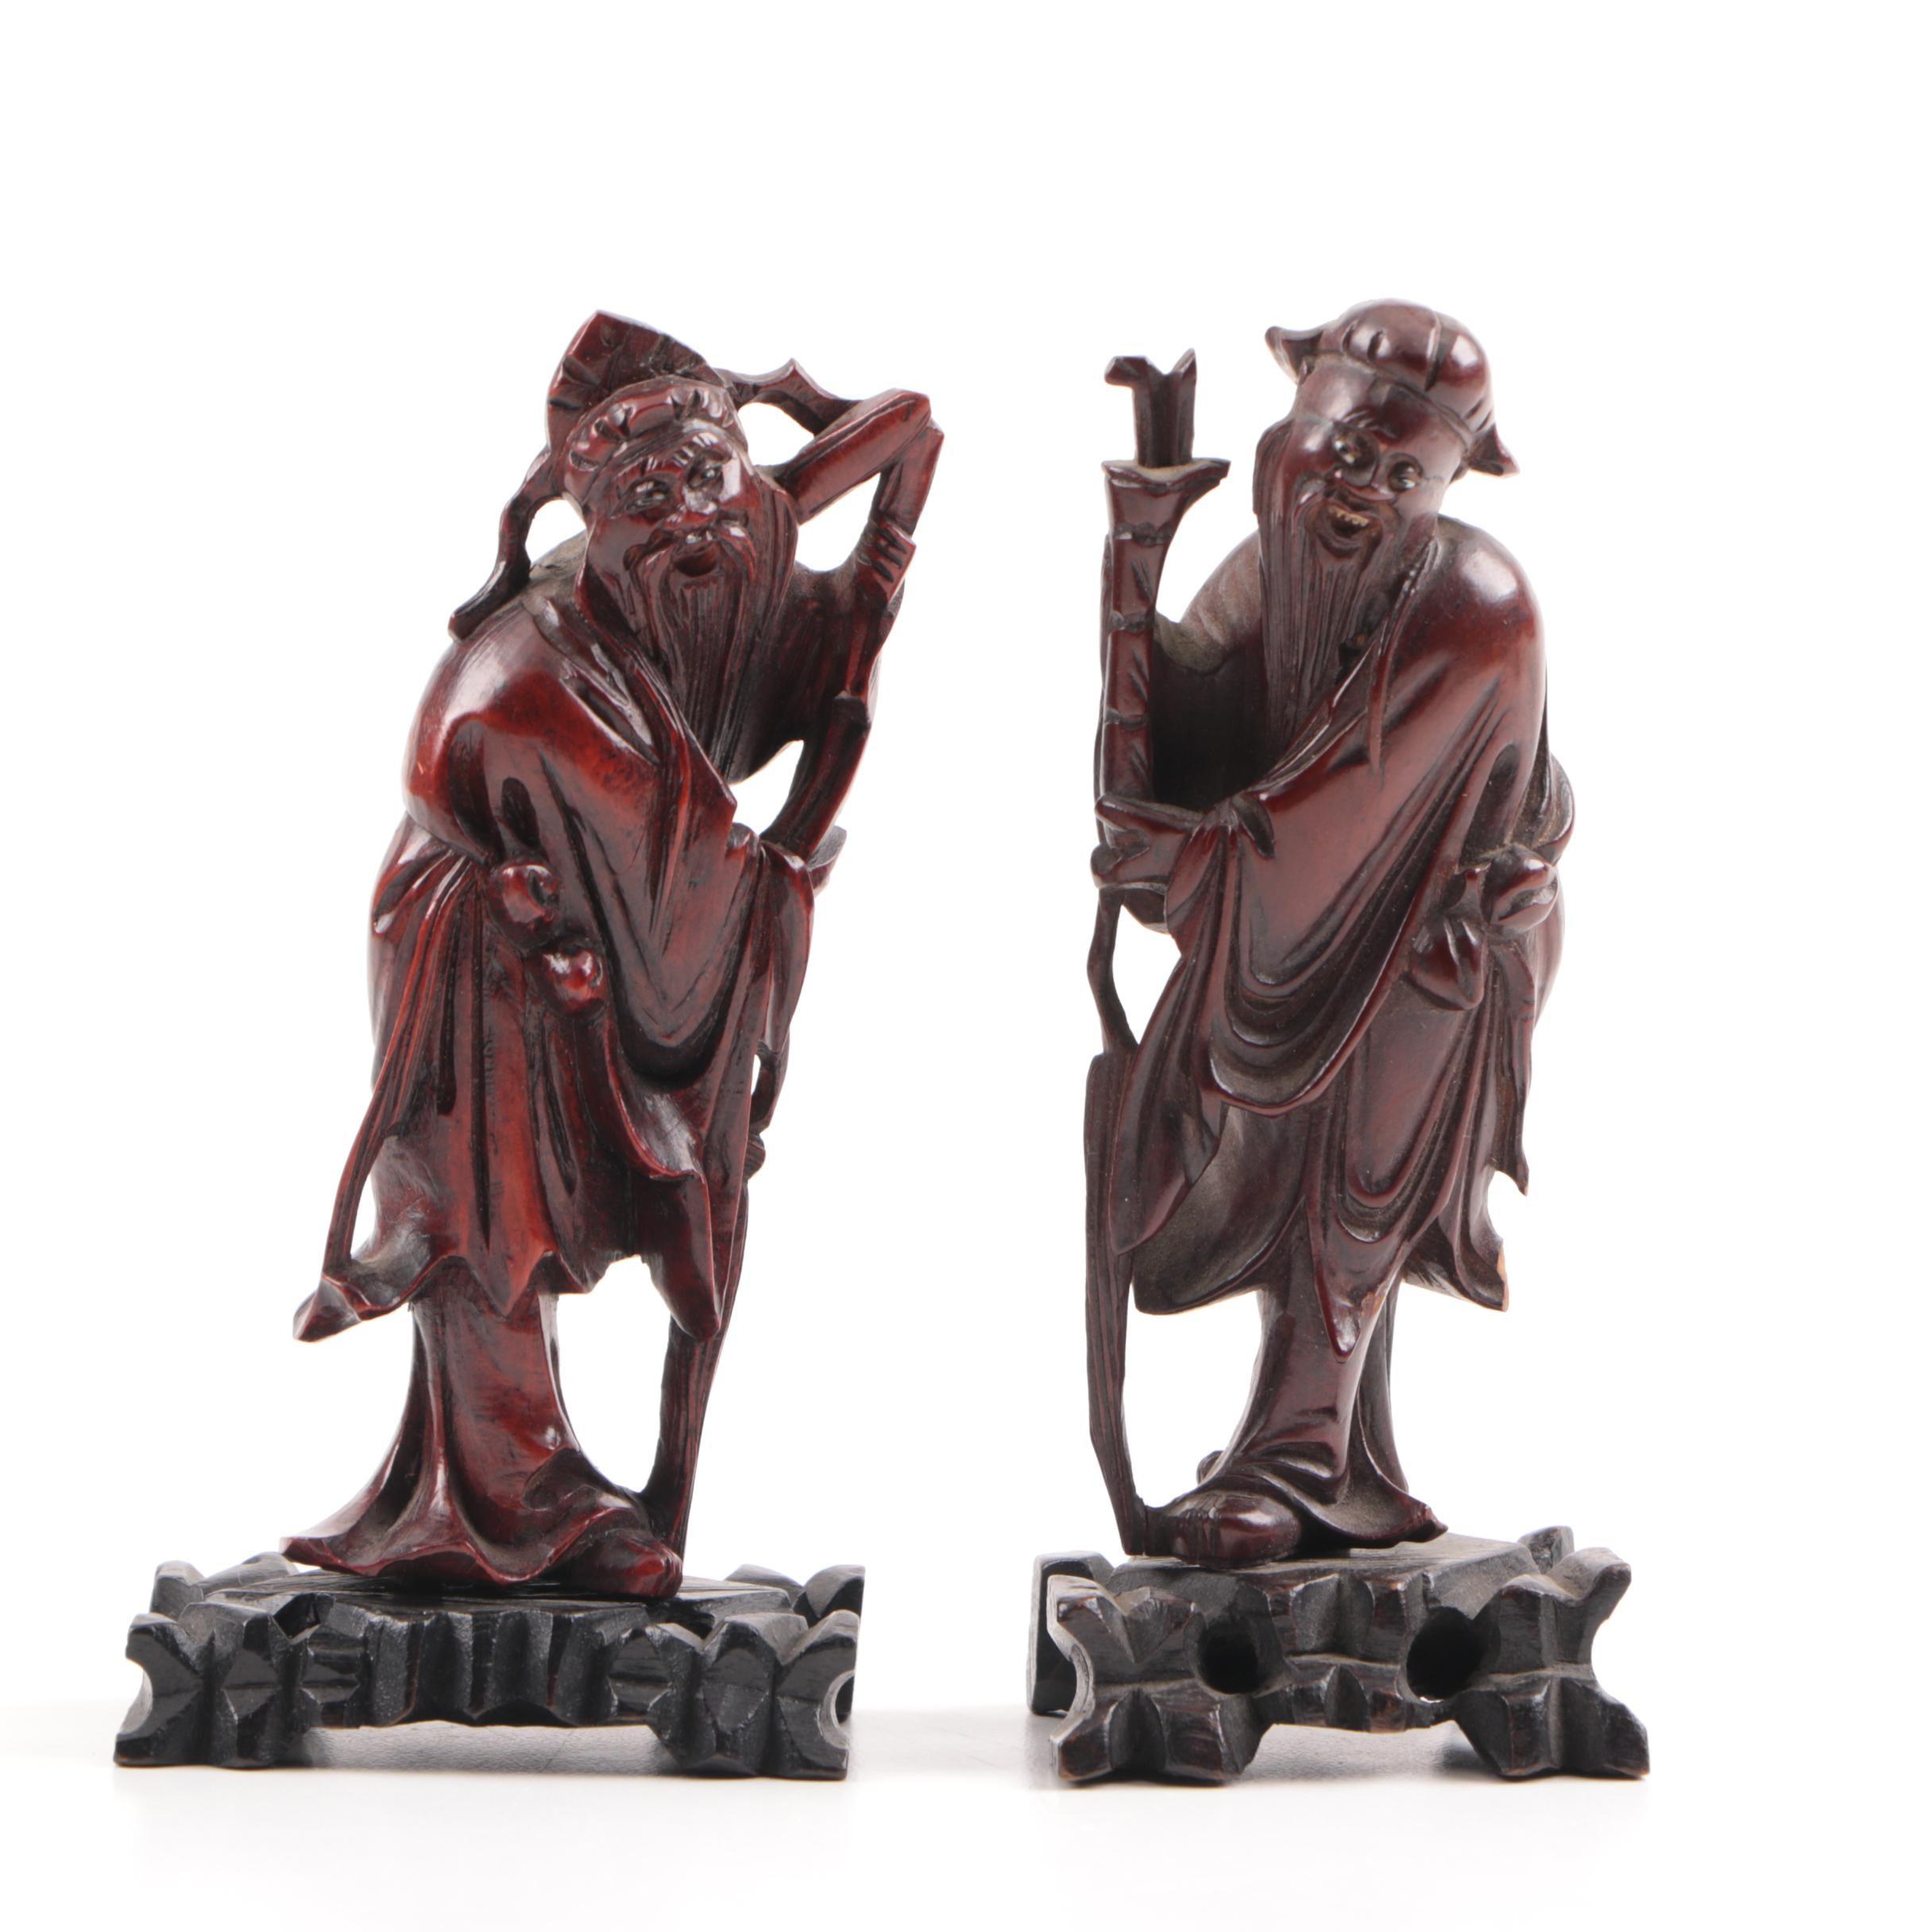 Pair of Chinese Carved Hardwood Peasant Figures, Republic